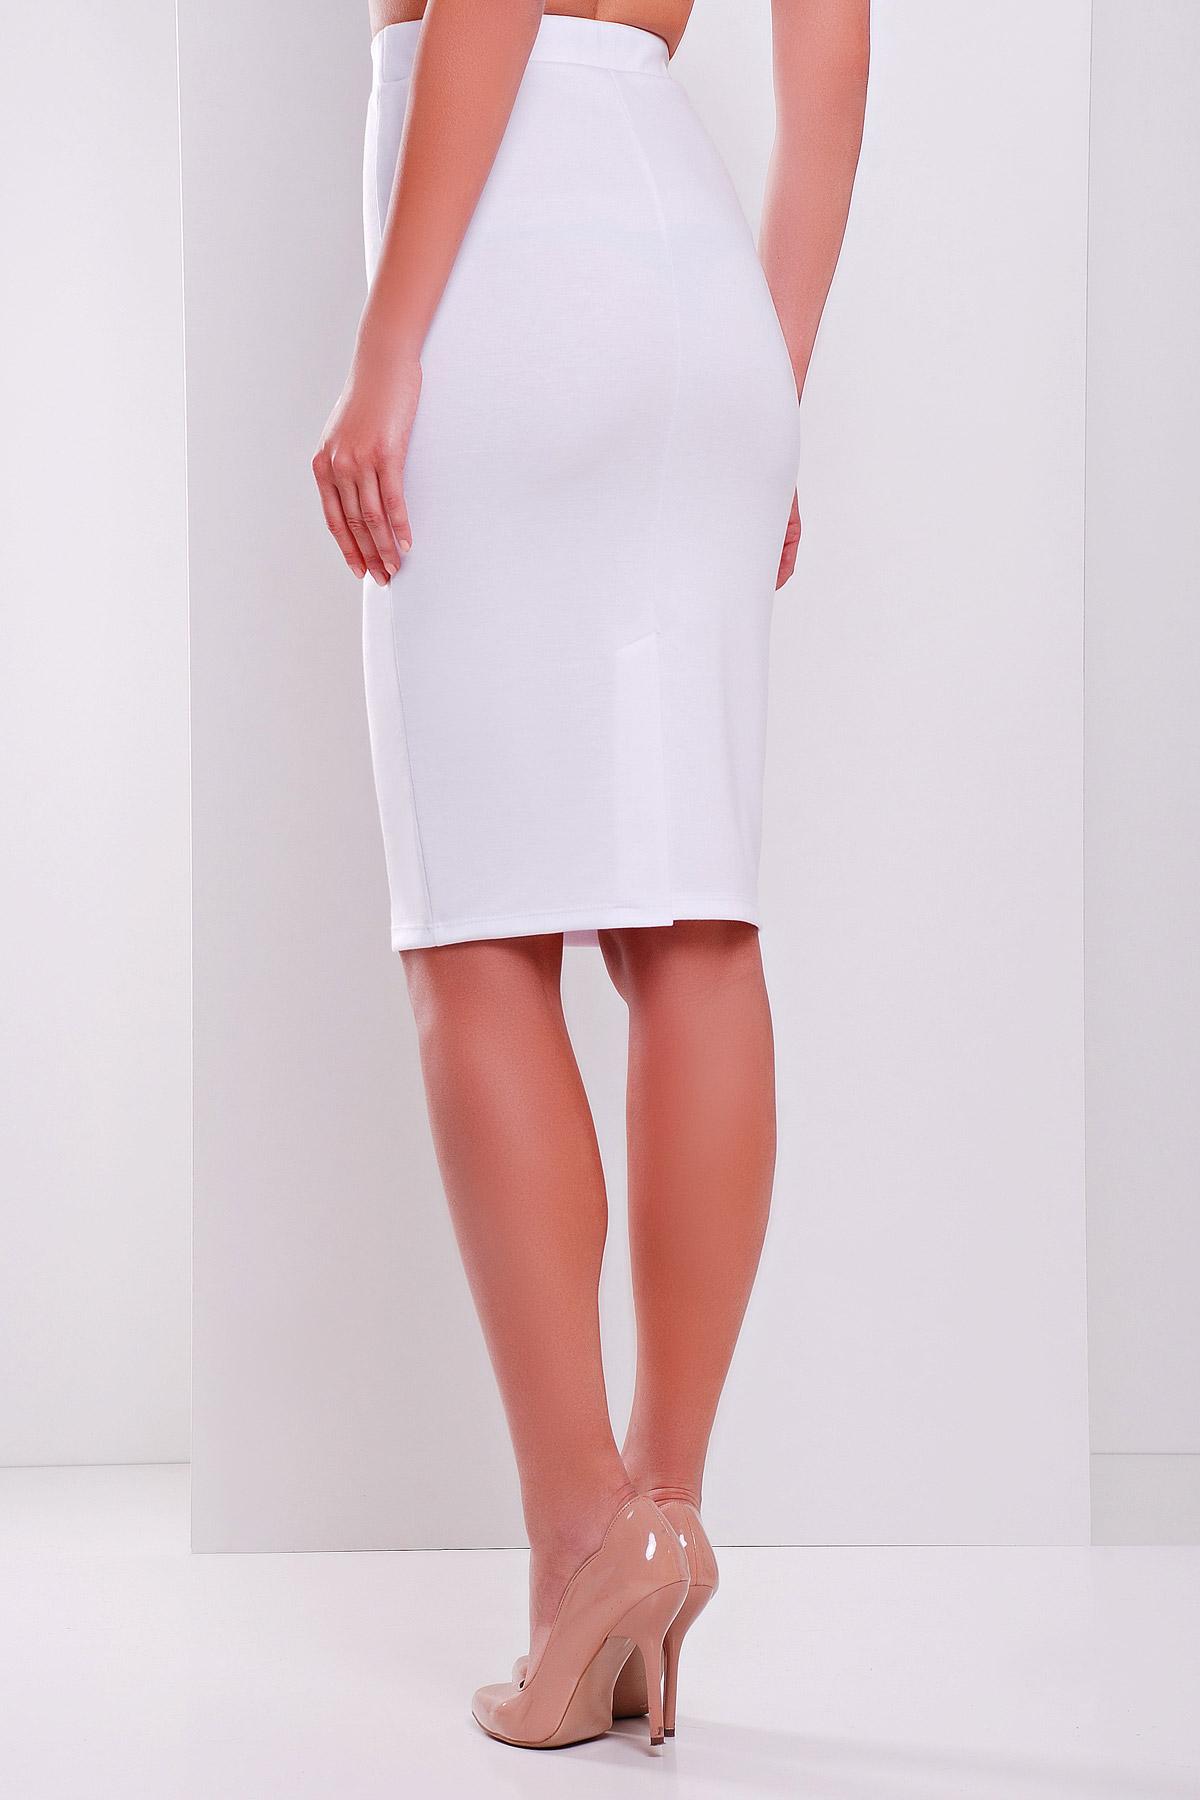 4f0767e7bf8 белая трикотажная миди юбка-карандаш. юбка мод. №20.